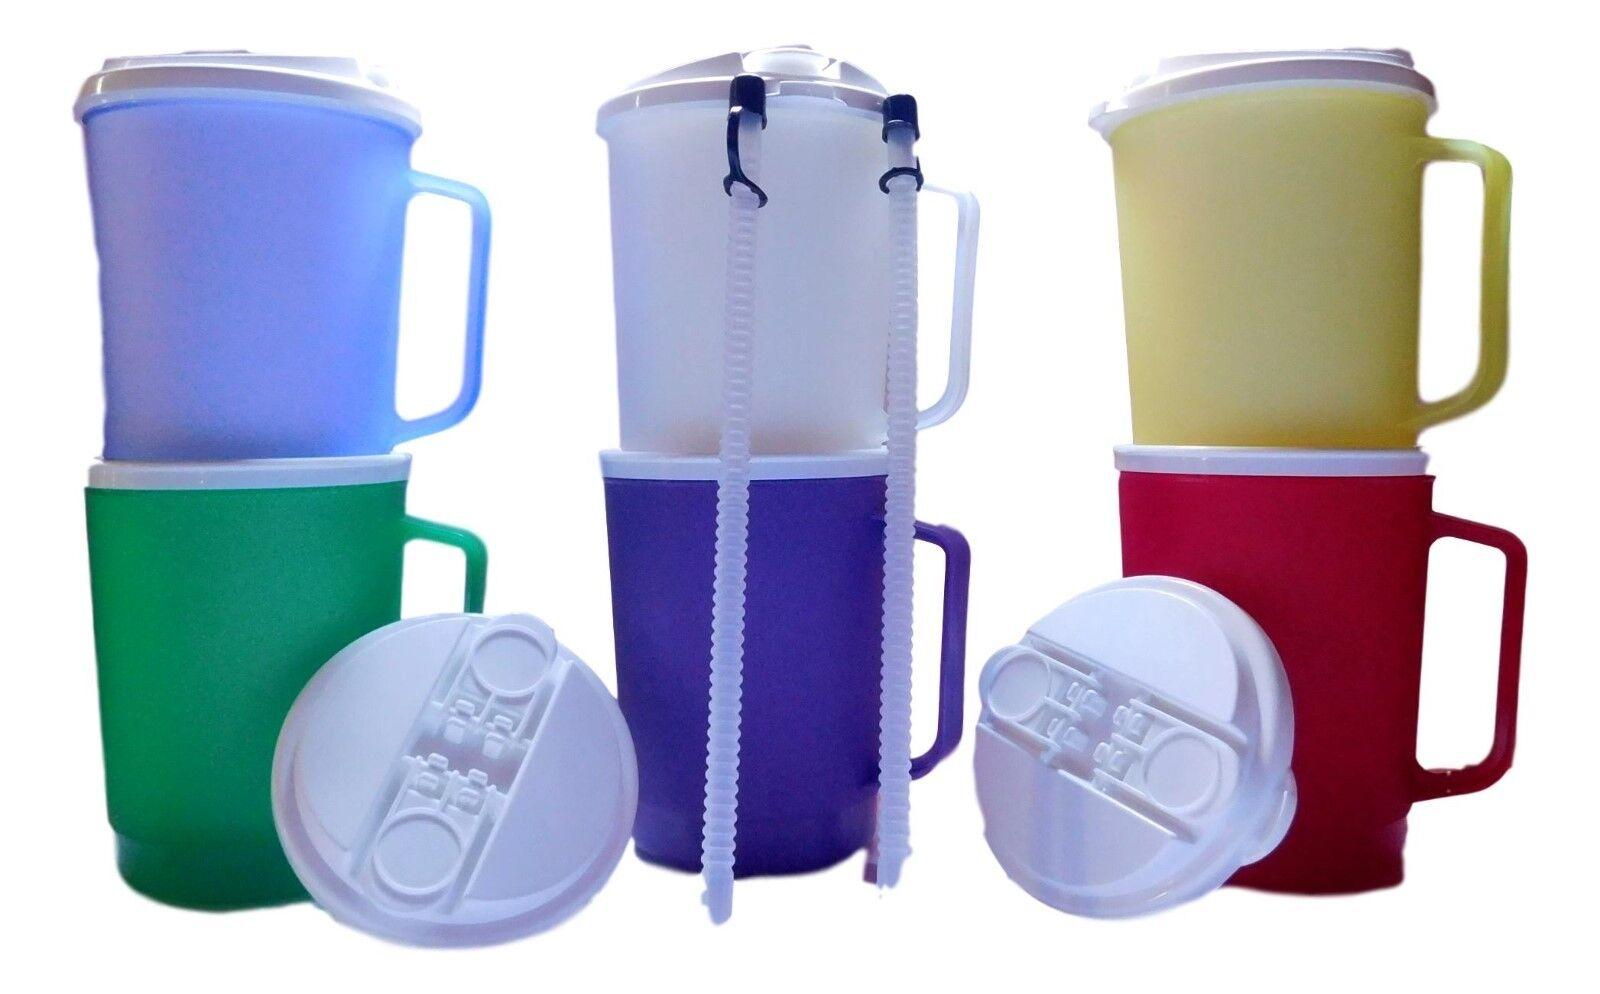 6 20 Ounce 1 ea.Mugs with Drink Thru  Flip-Sip Lids & Straws Mfg USA- 6 colors